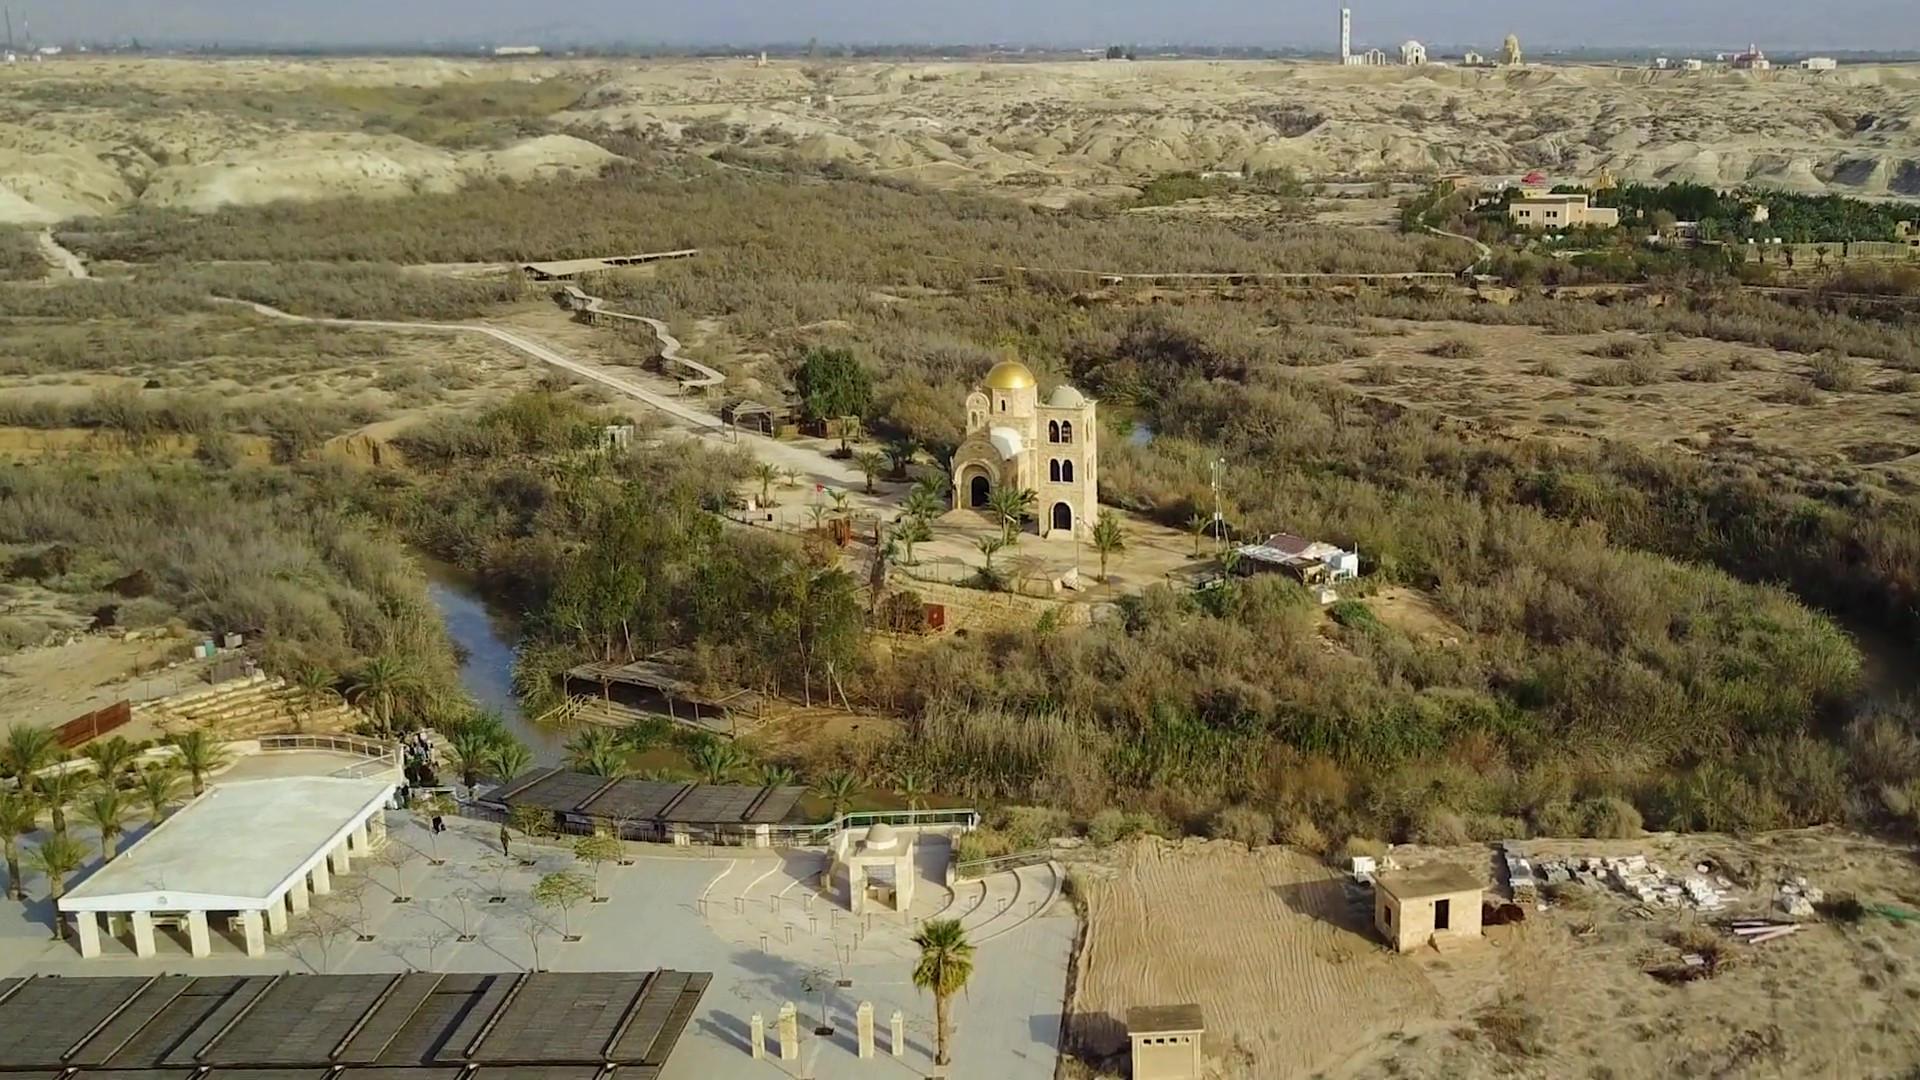 Qsar al Yahud Baptism Site6.jpg